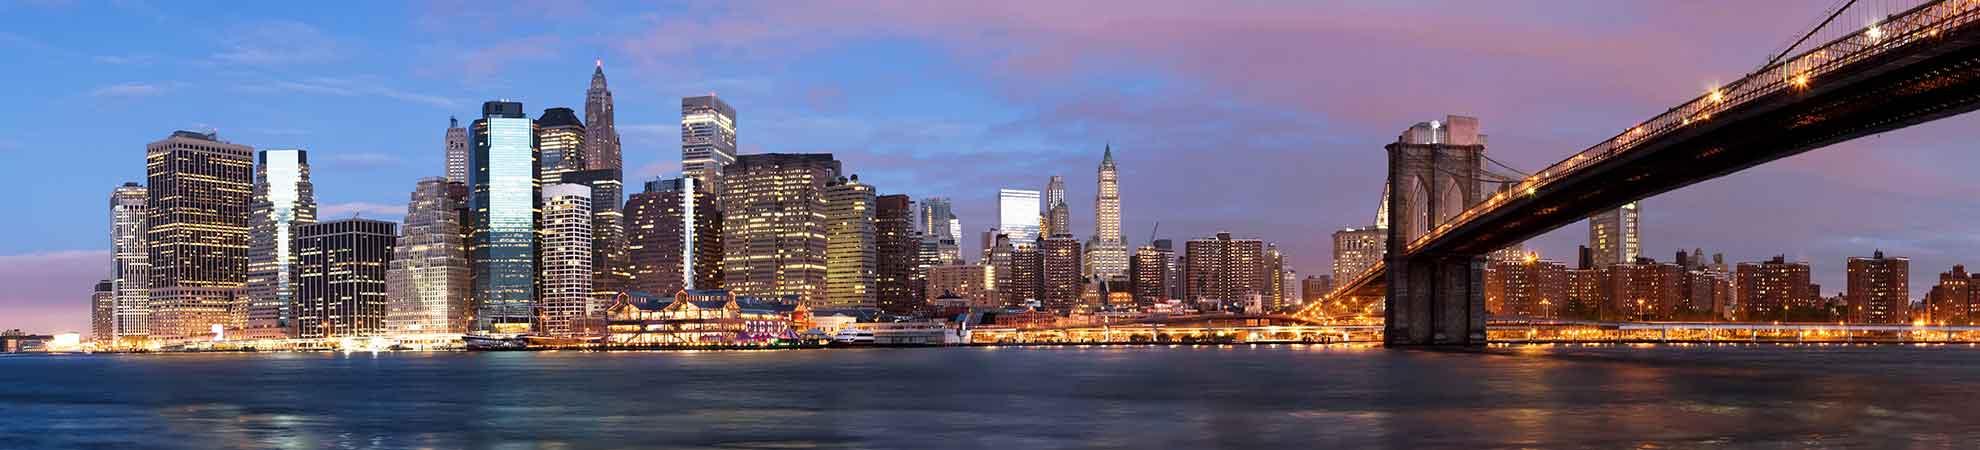 Voyage New York 5 jours